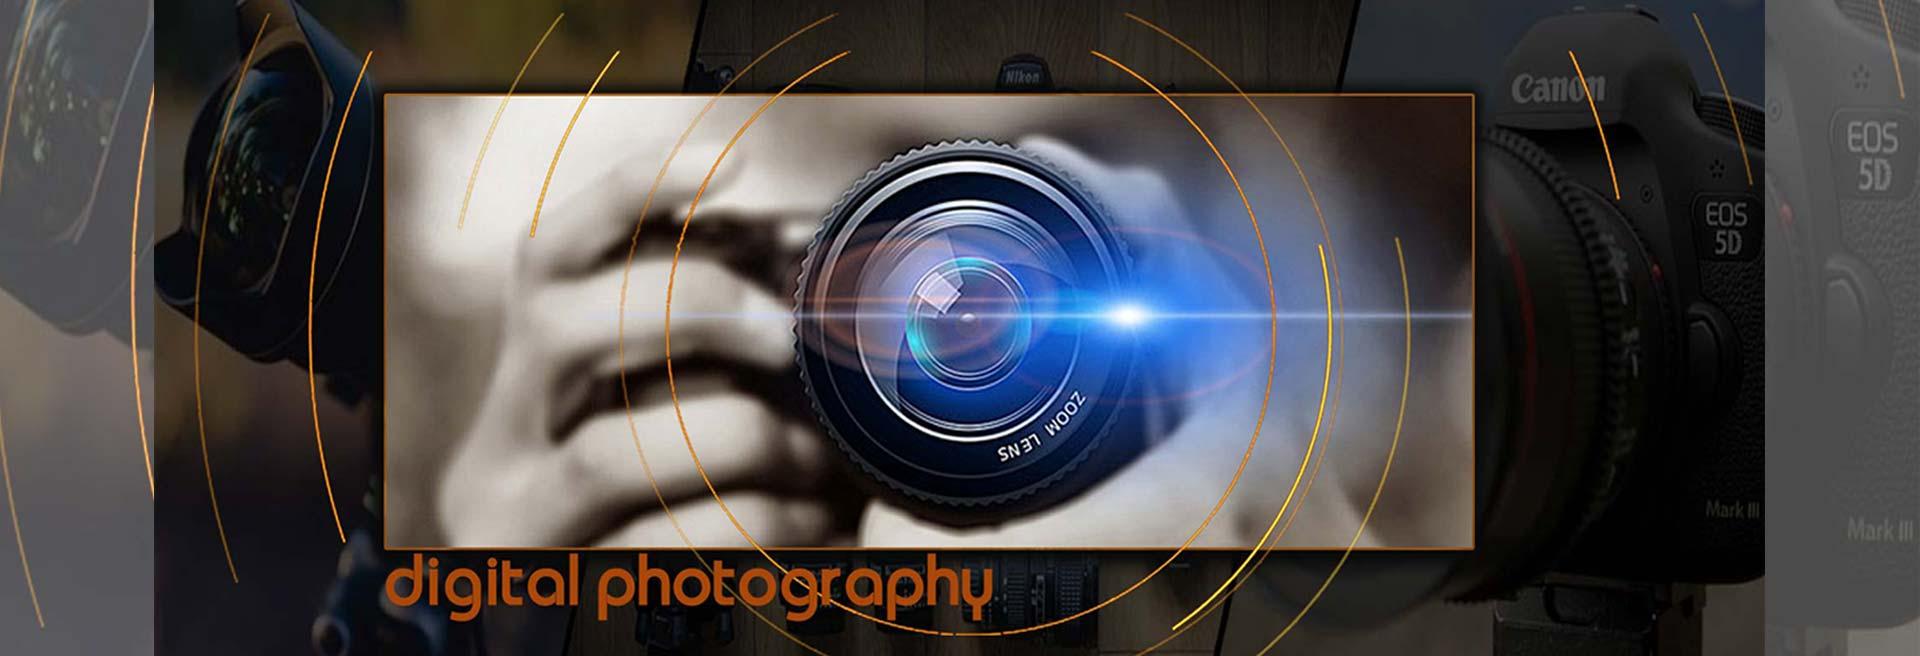 digital photography akasi 11a 1 - عکاسی دیجیتال و آشنایی با آن